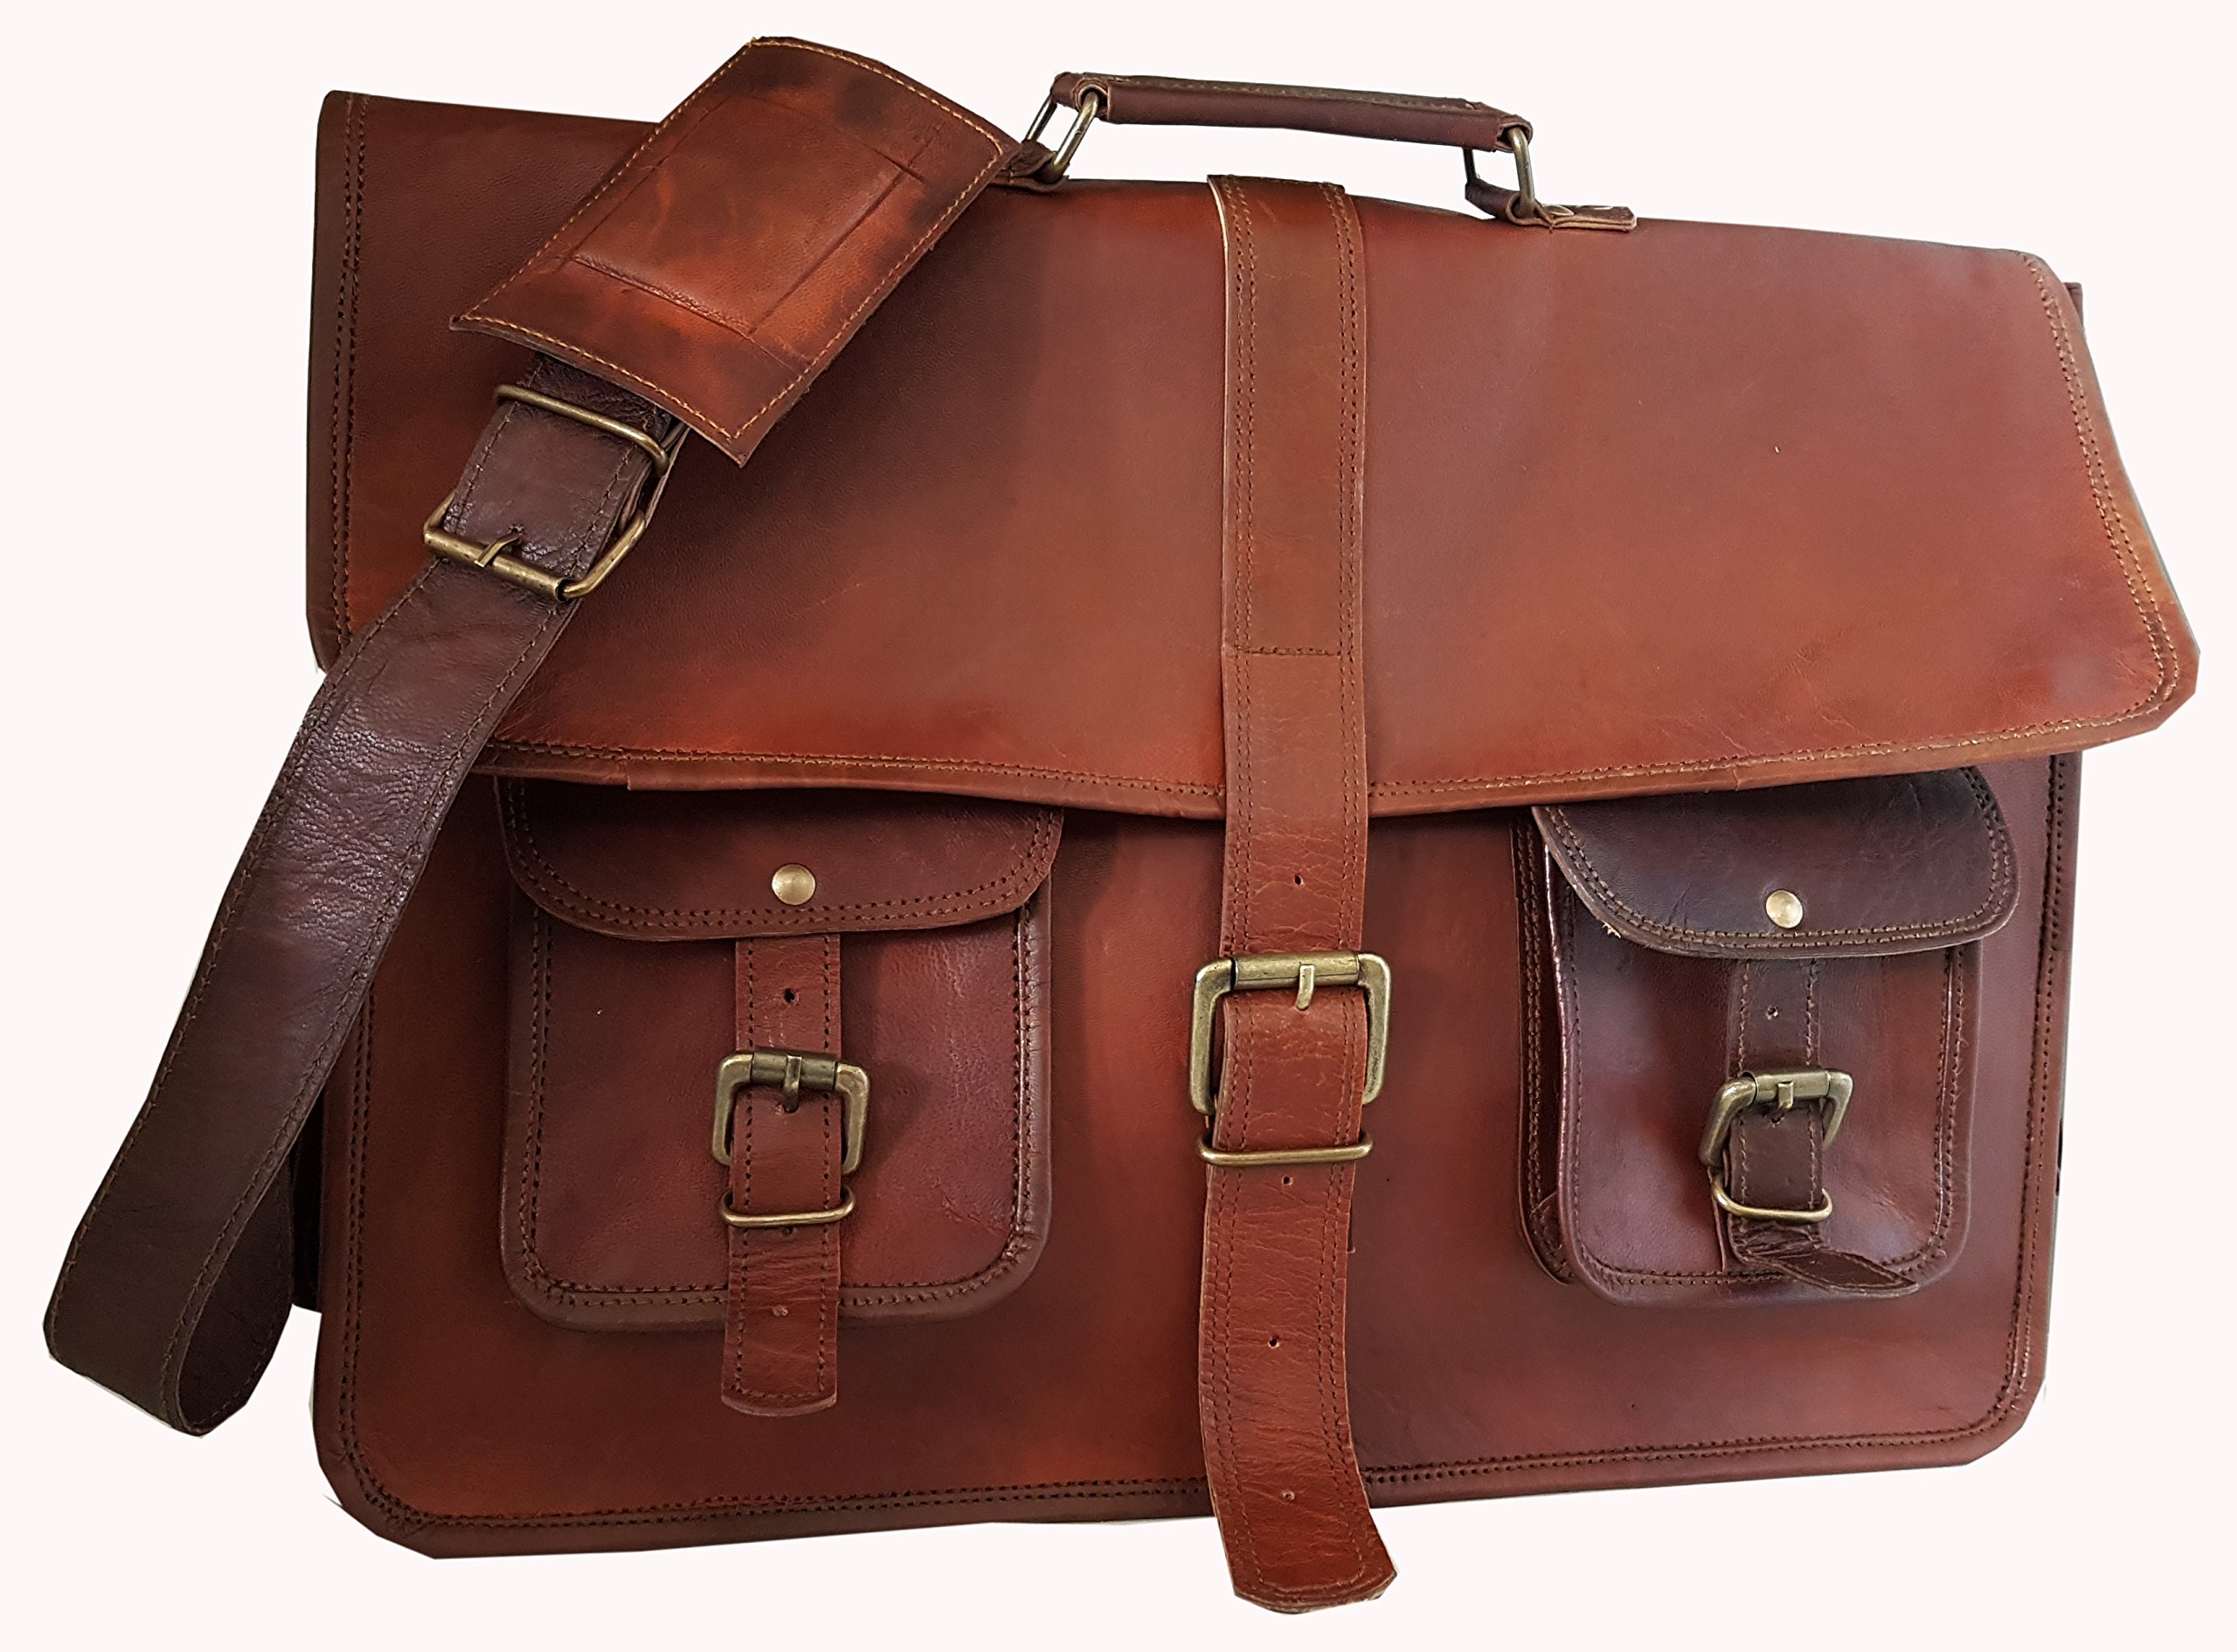 HLC 18'' Inches Classic Adult Unisex Cross Shoulder Leather Messenger Laptop Briefcase Bag Satchel Brown